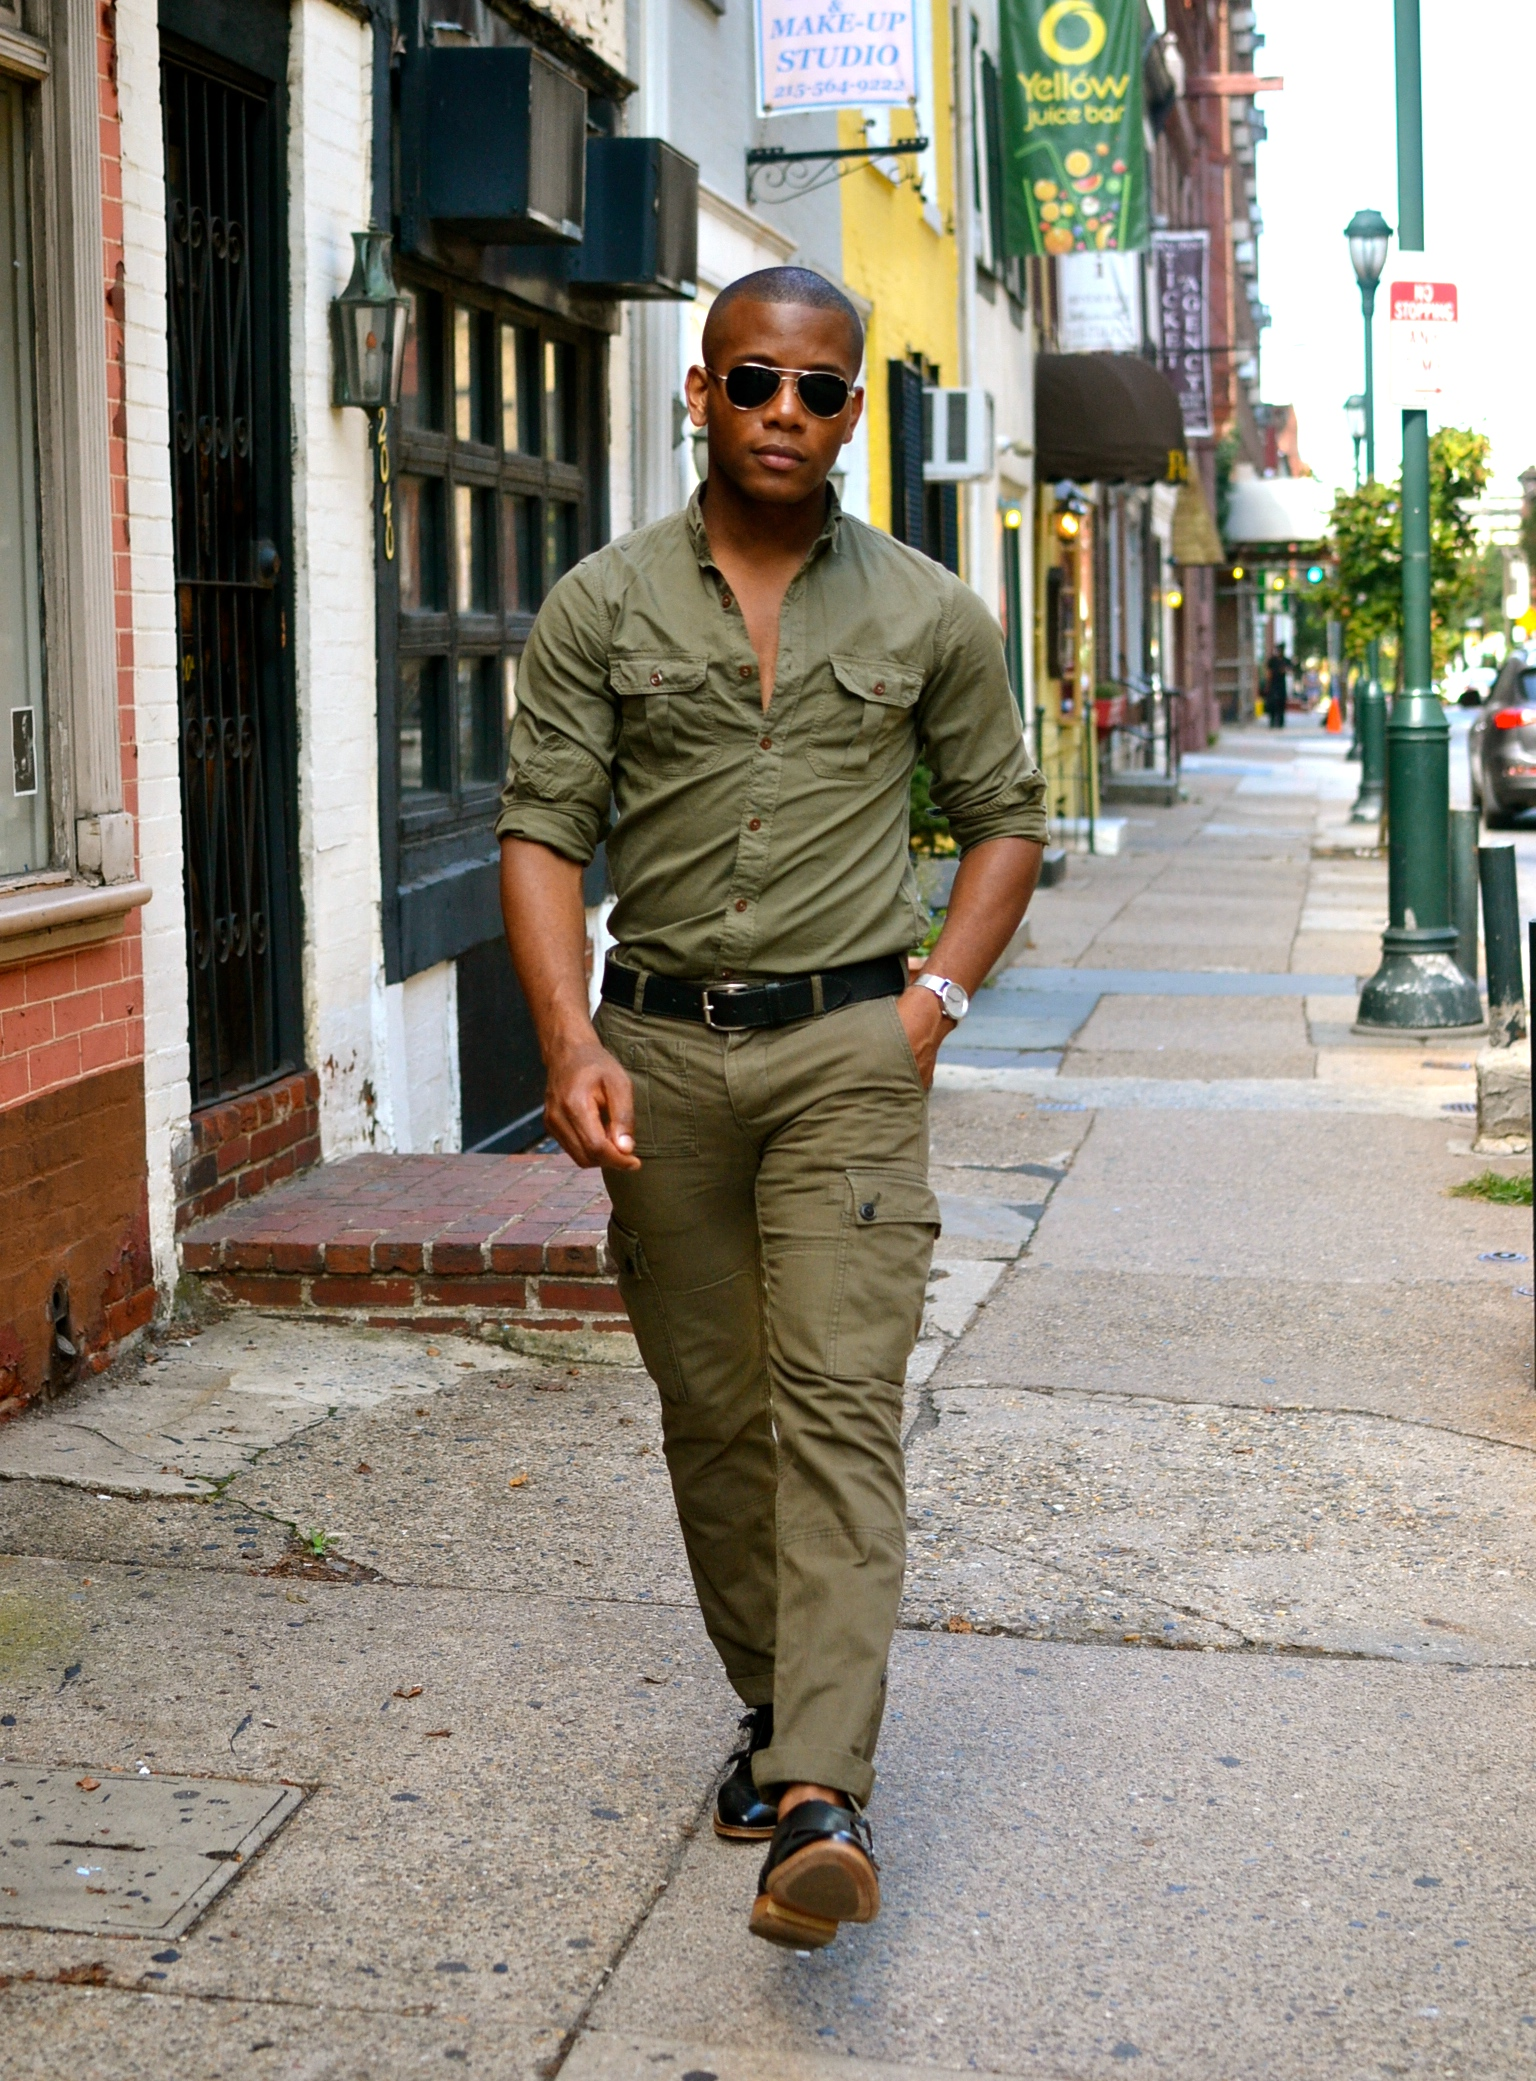 Men's Style Pro in Gap/Todd Snyder & Jcrew + Johnston & Murphy Black double monk straps